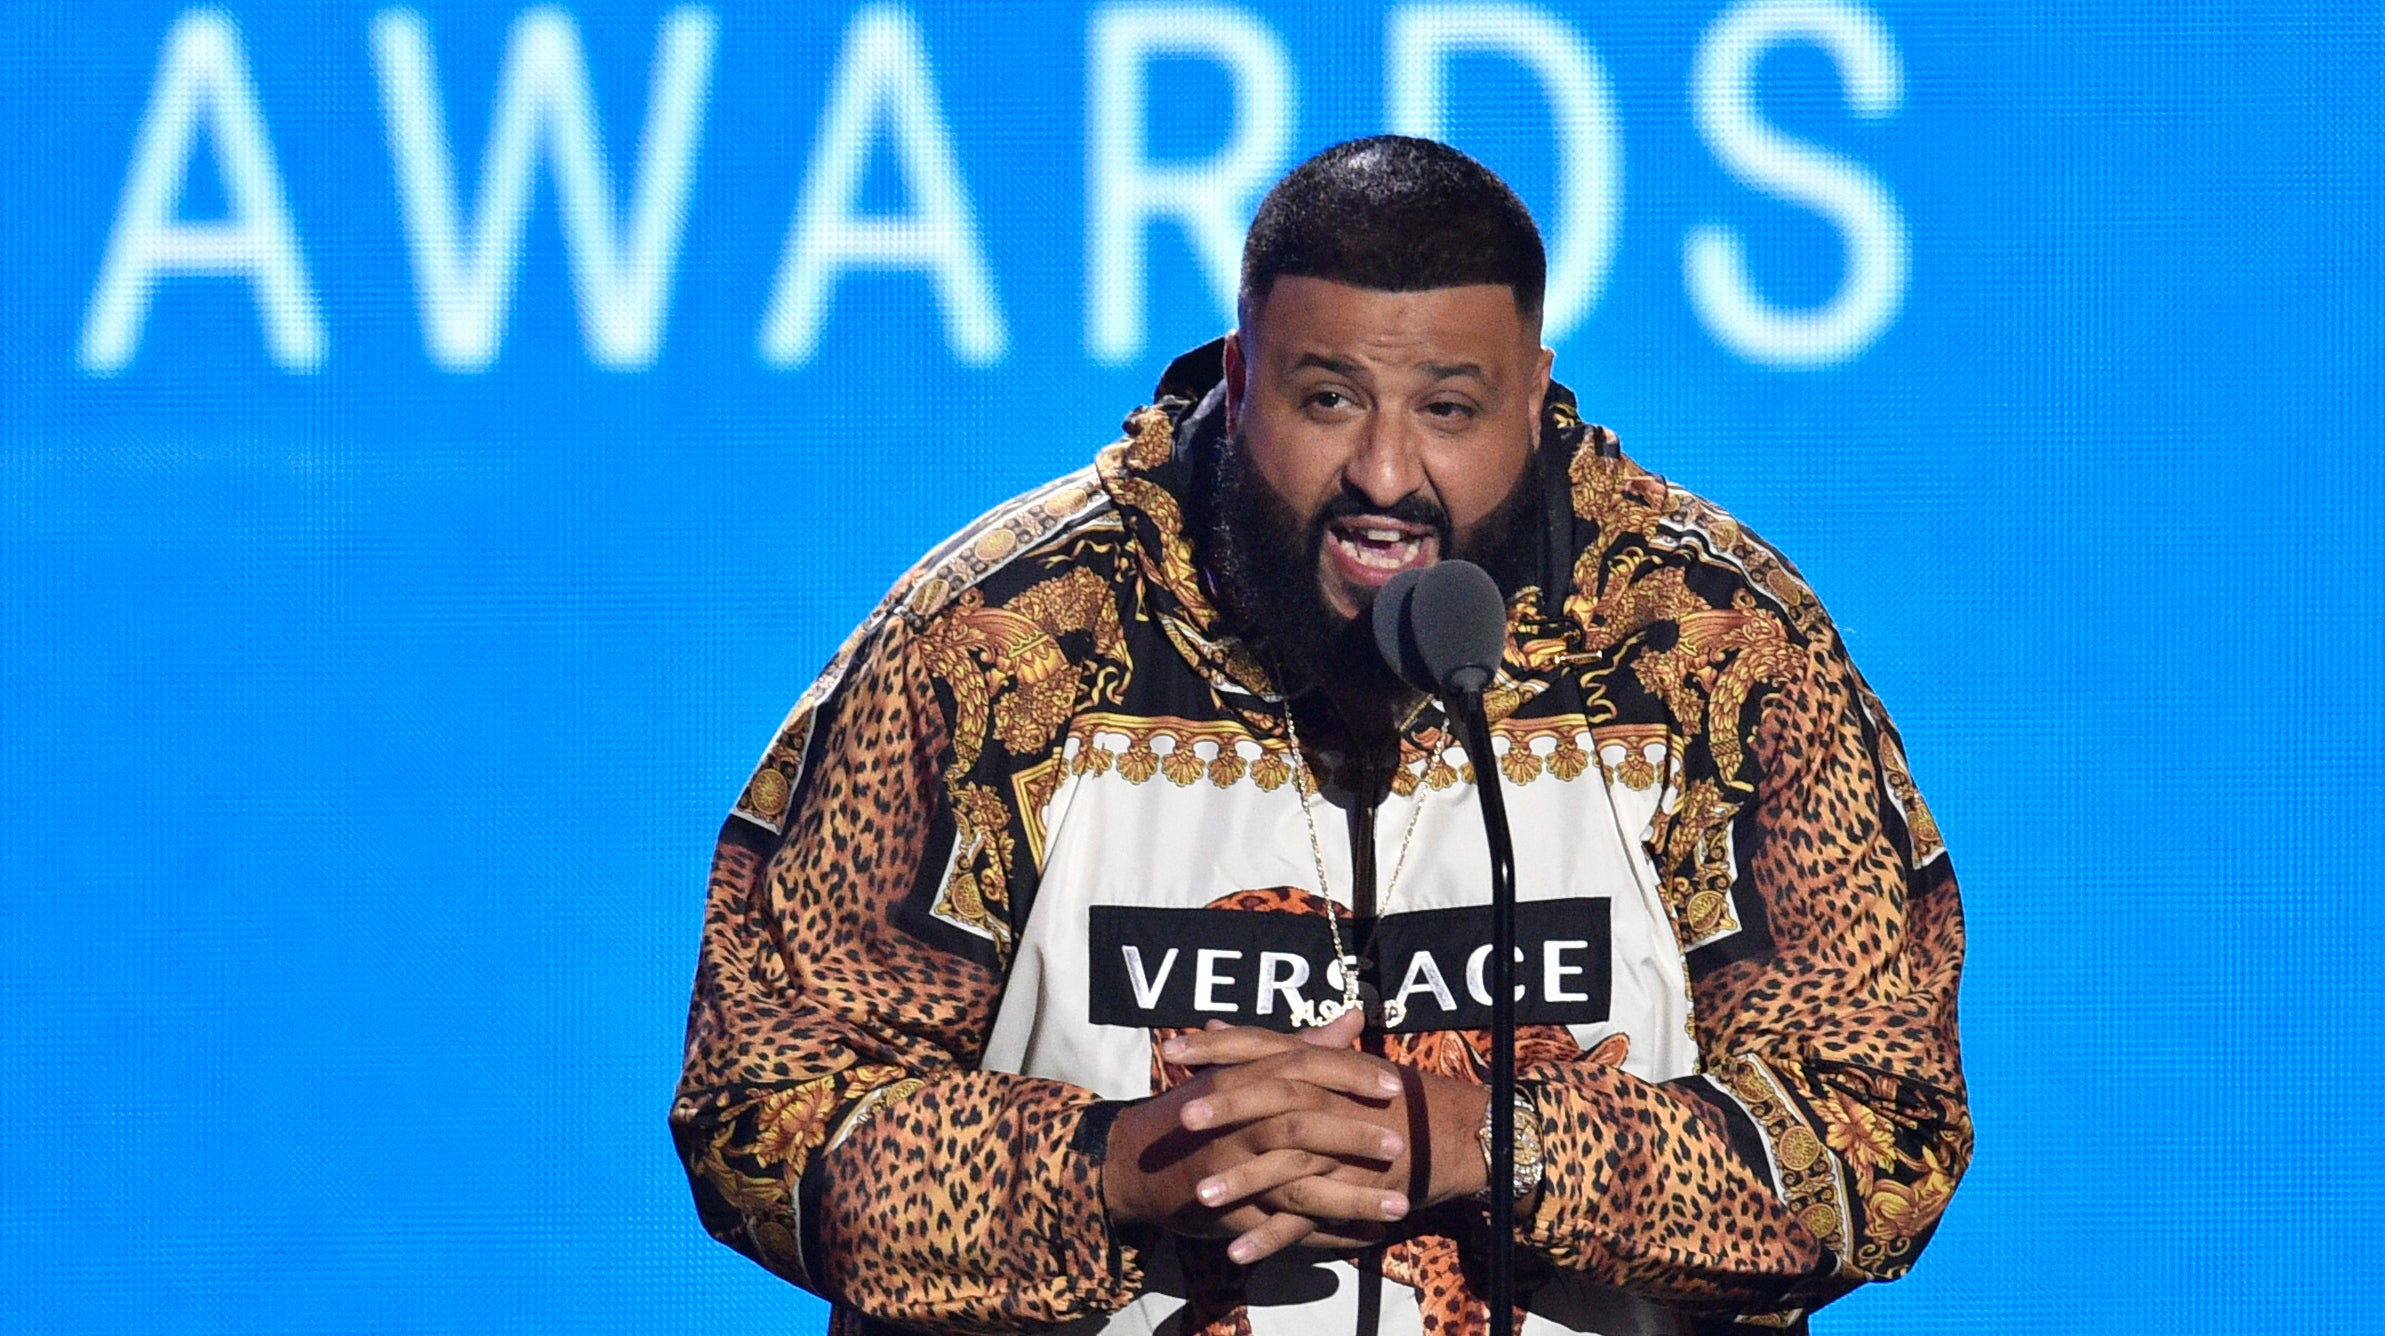 SEC Informs DJ Khaled That He Has Played Himself